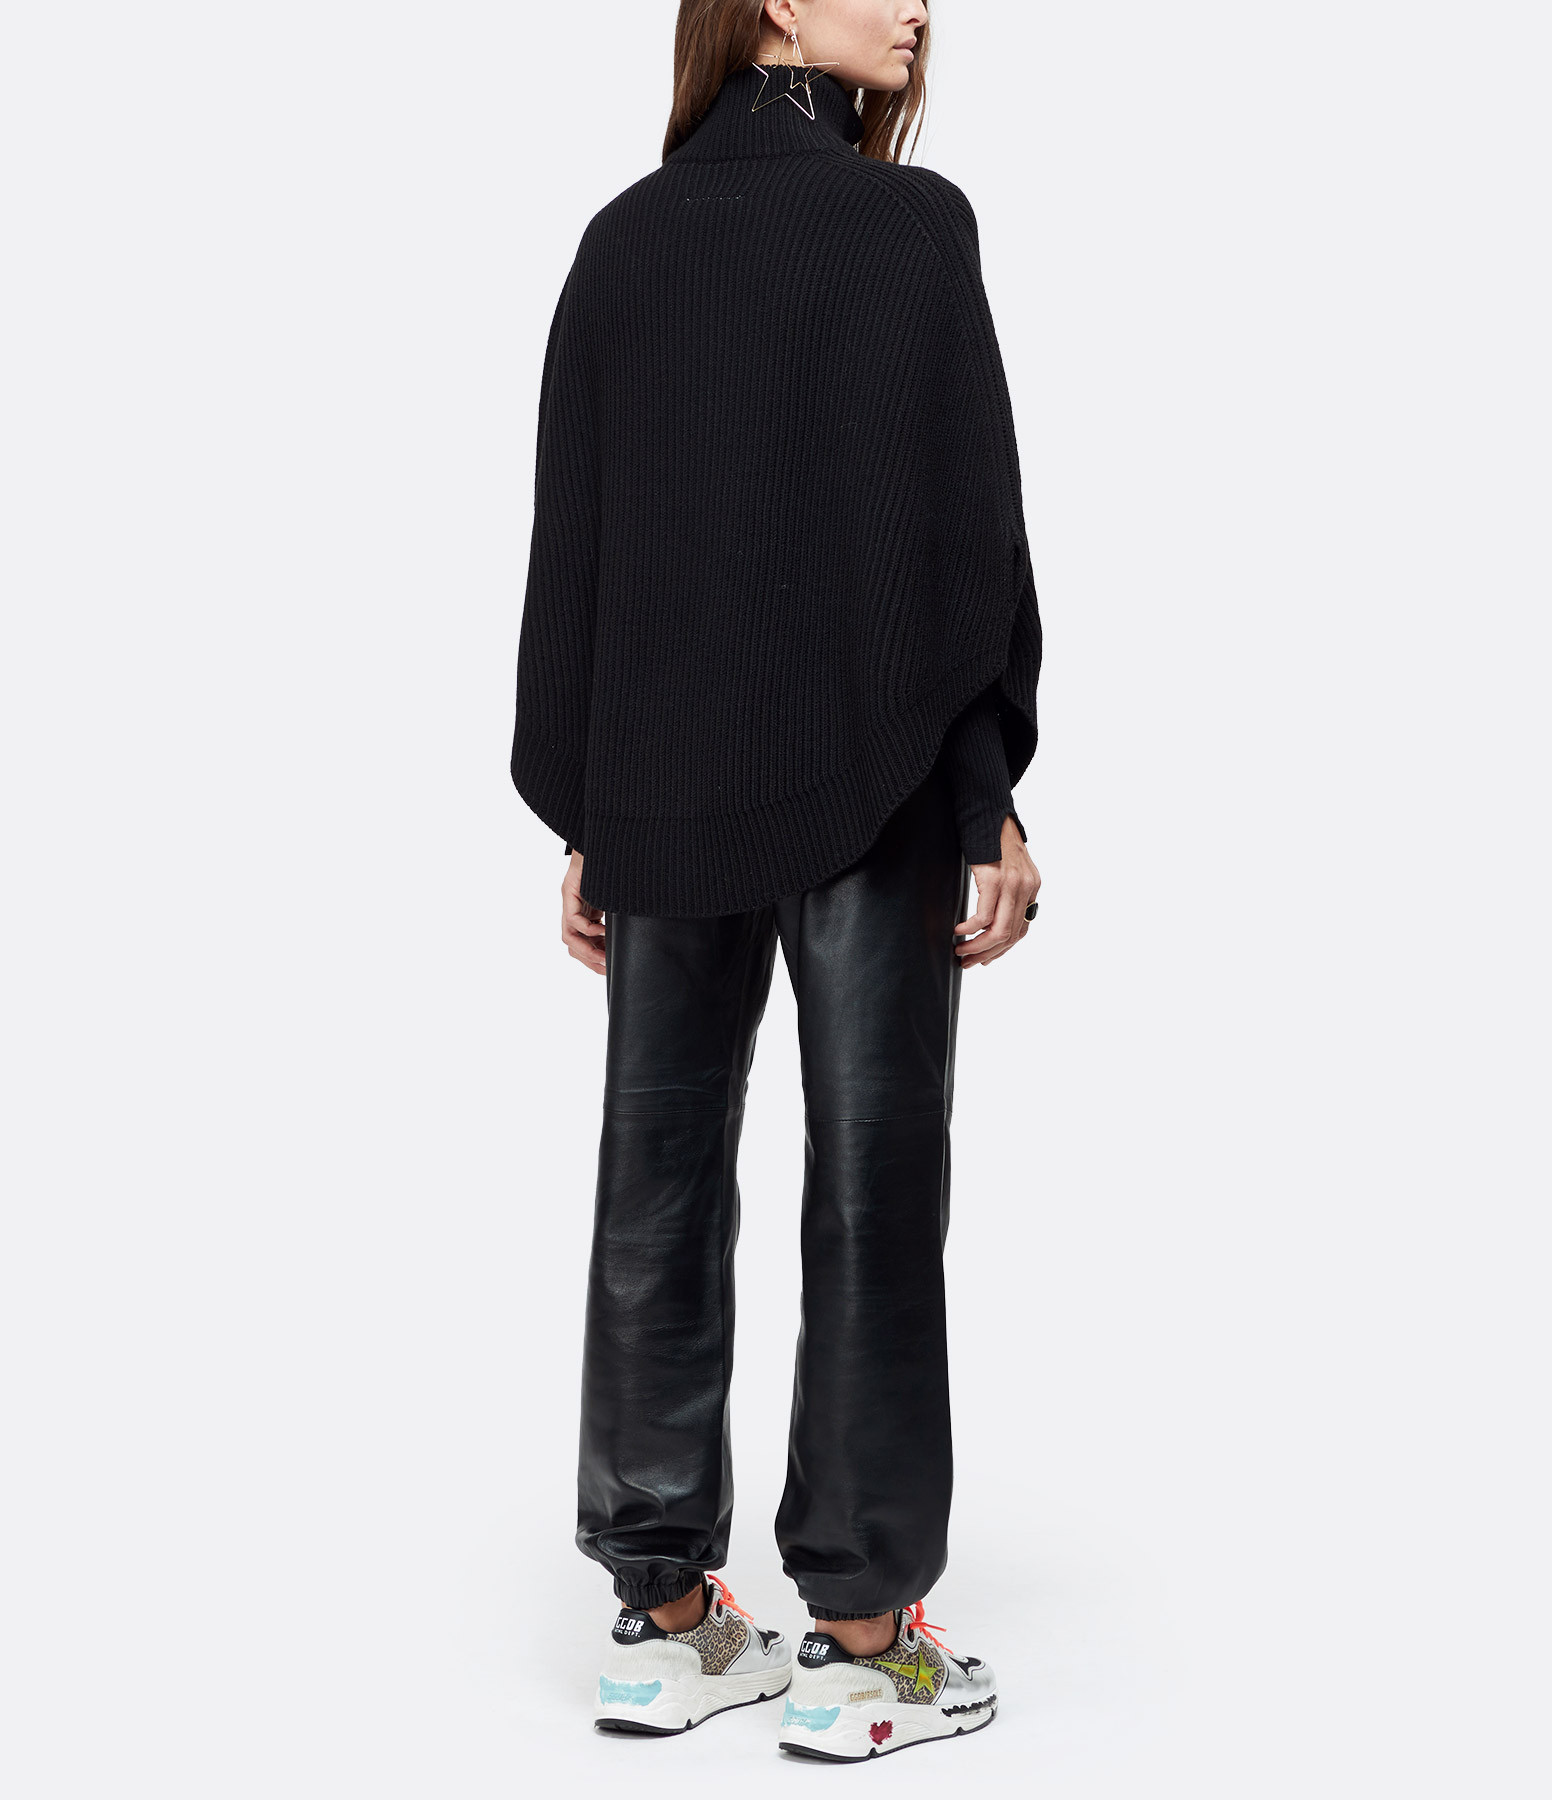 MM6 MAISON MARGIELA - Sweatshirt Noir, Collection Studio